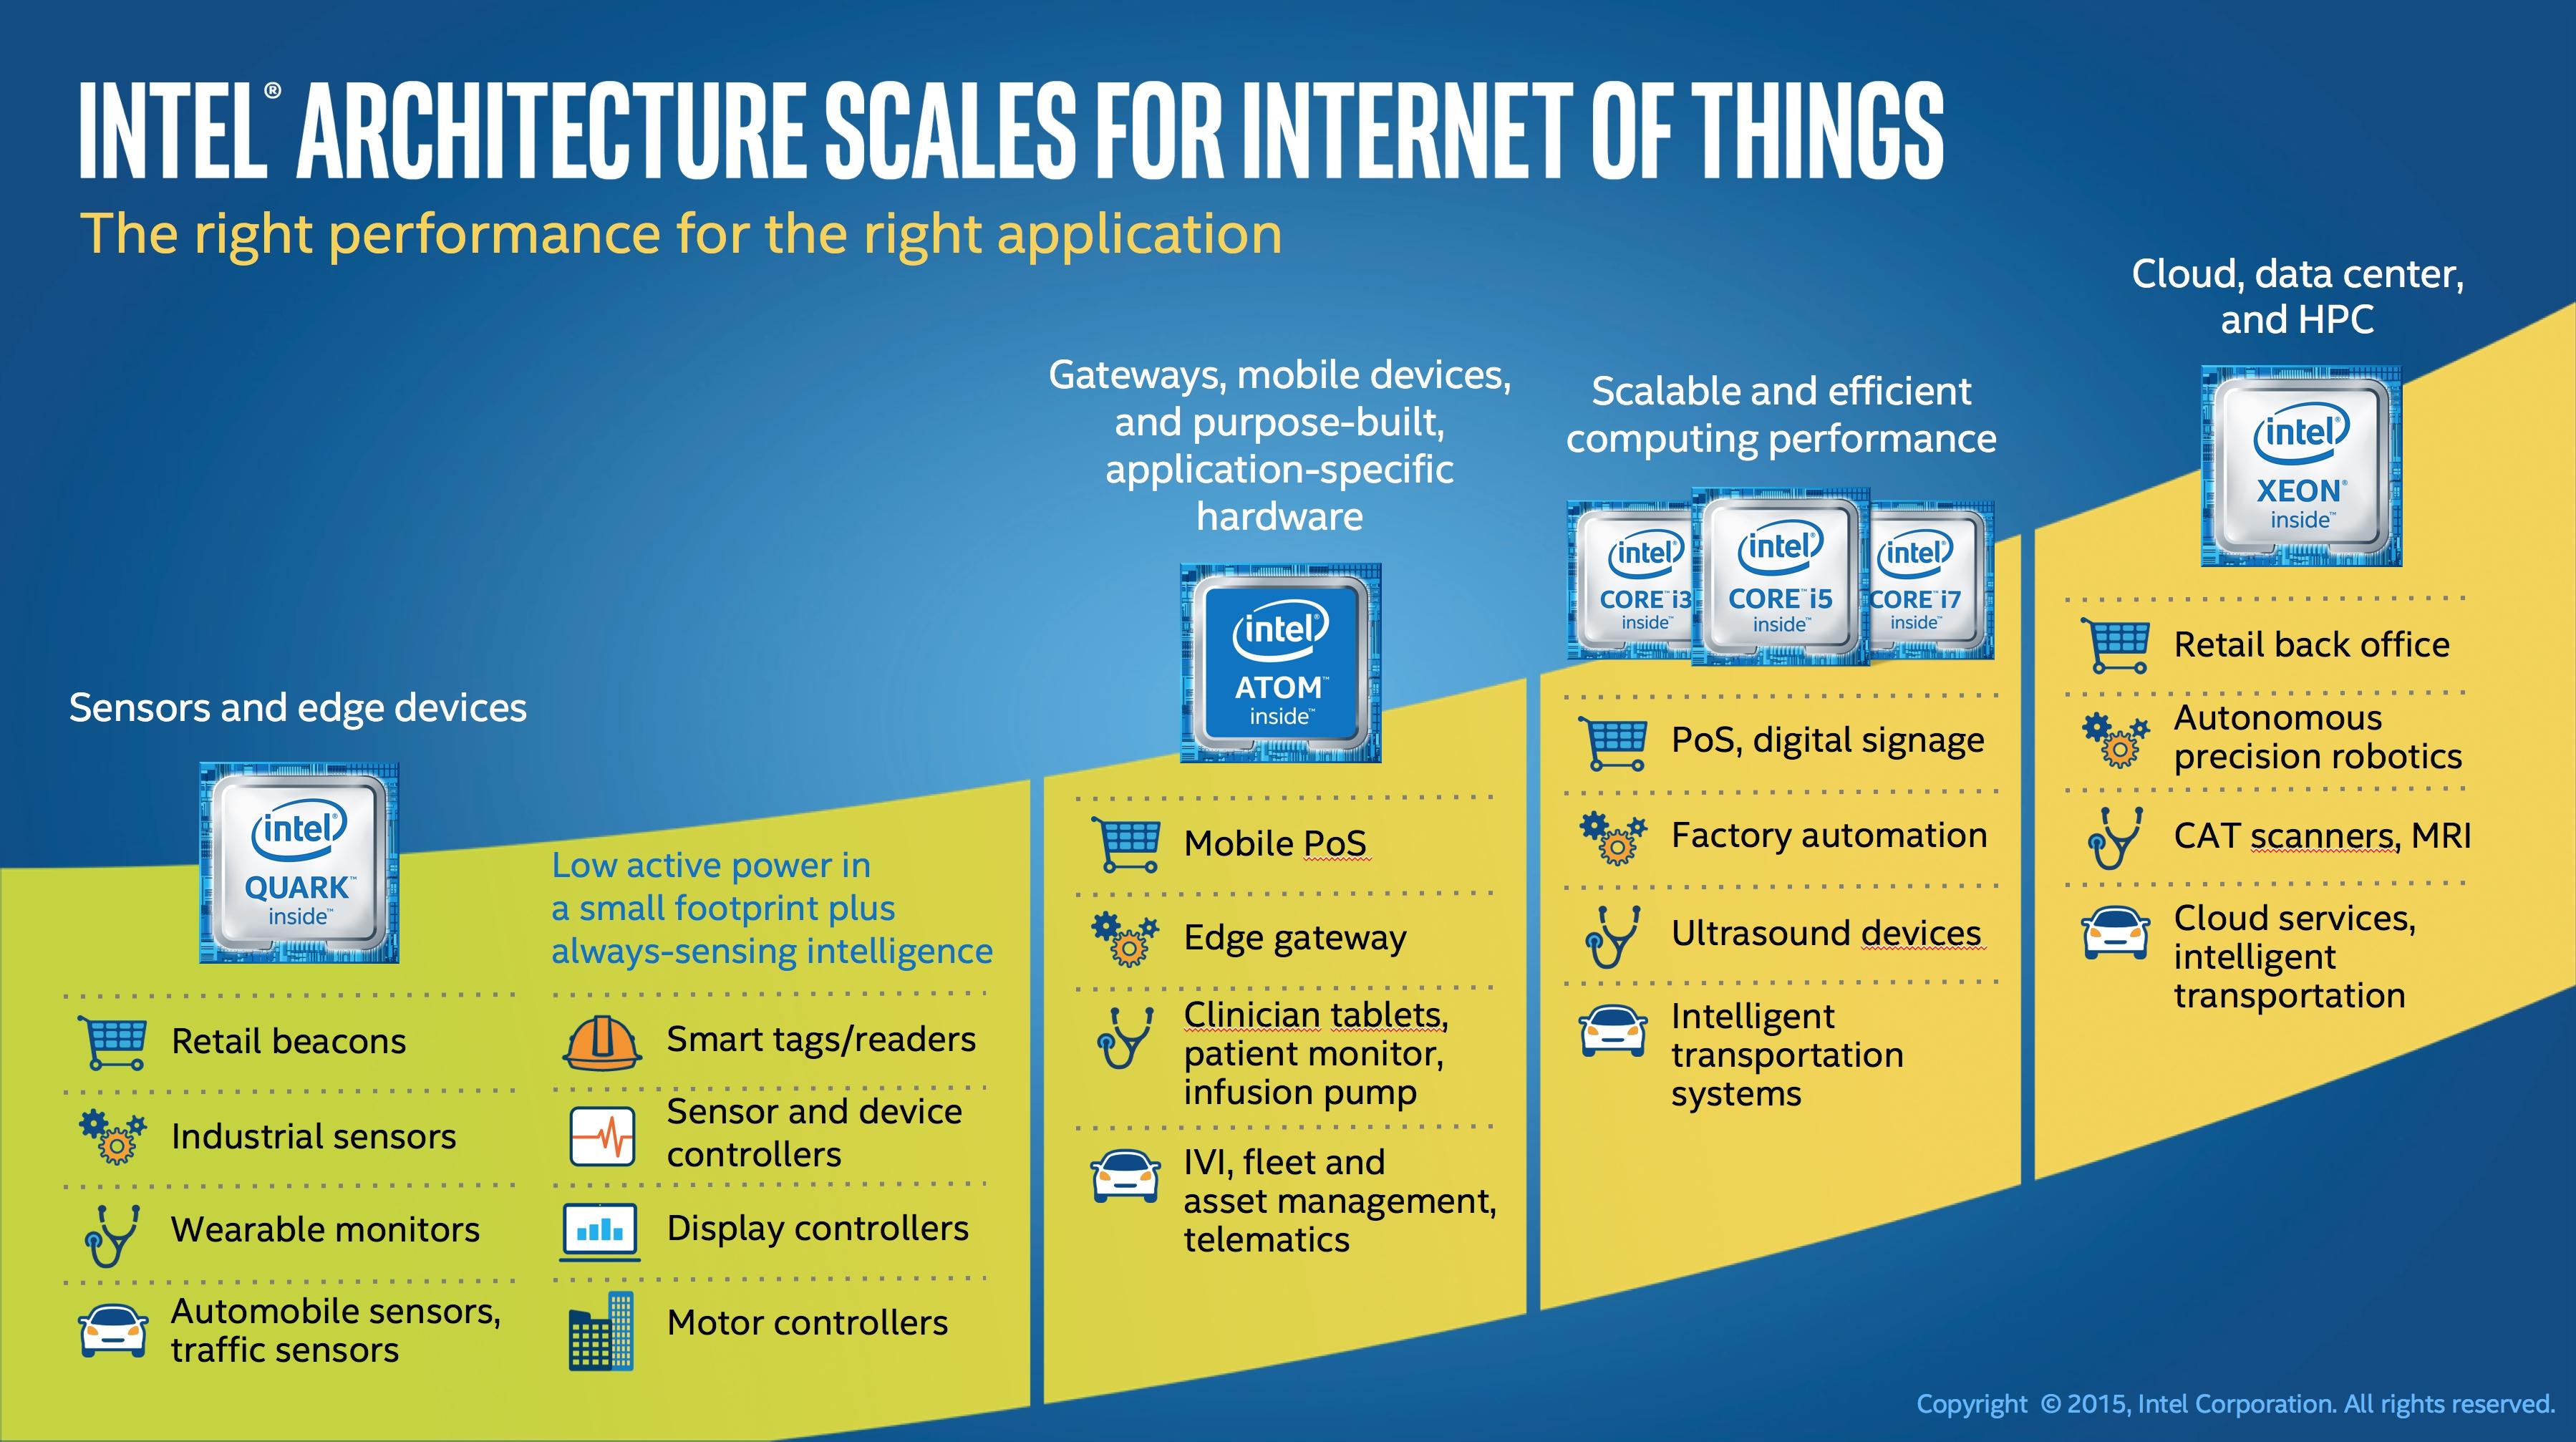 Intel leverer alt fra sensorer og knøtt-CPU-er til kraftige Xeon-server-CPU-er.